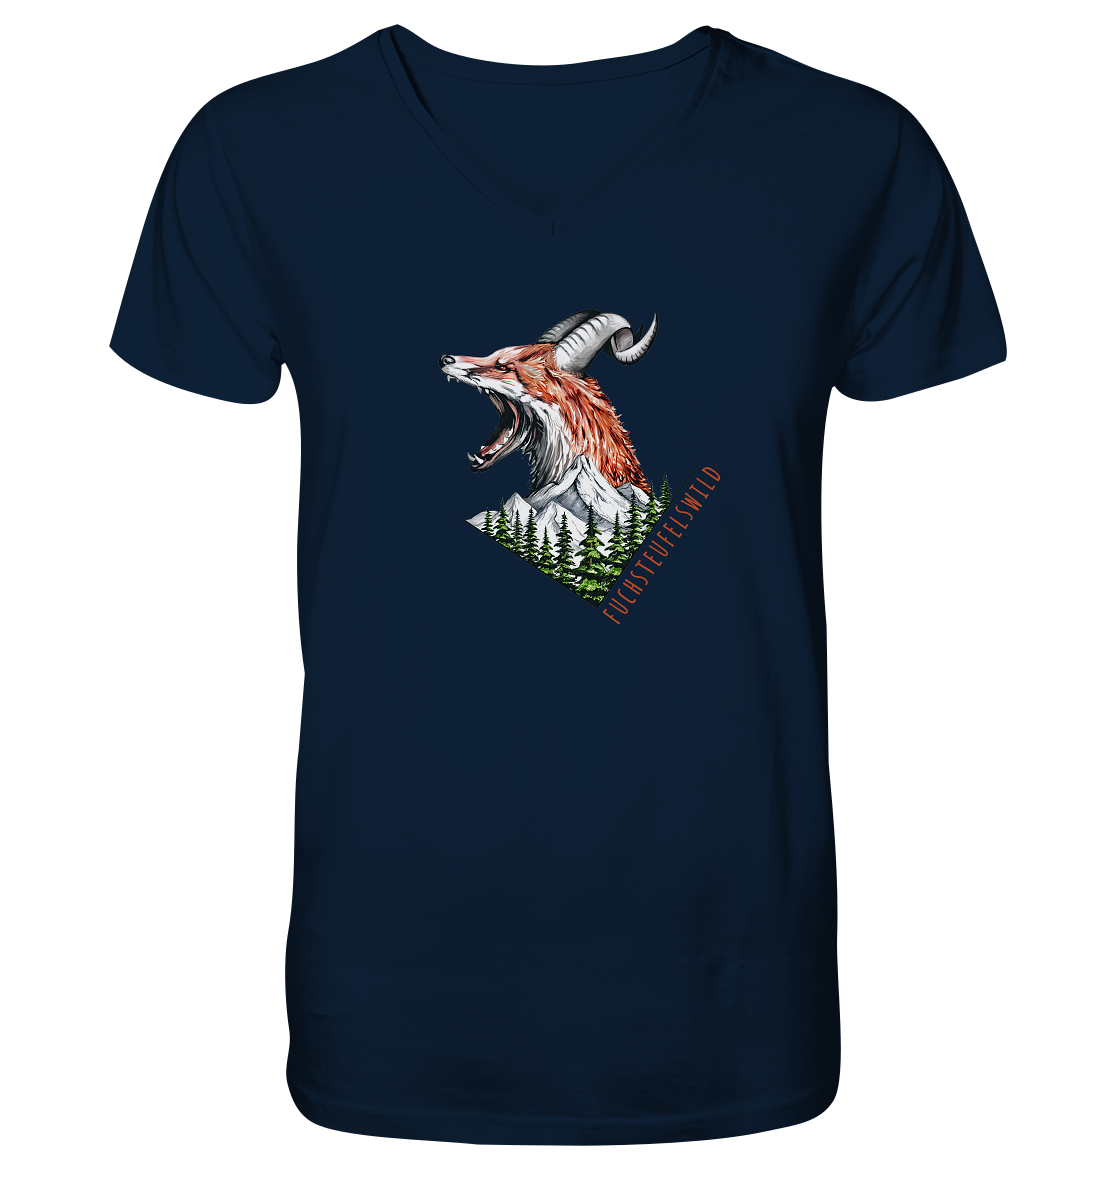 front-mens-organic-v-neck-shirt-0e2035-1116x-1.png